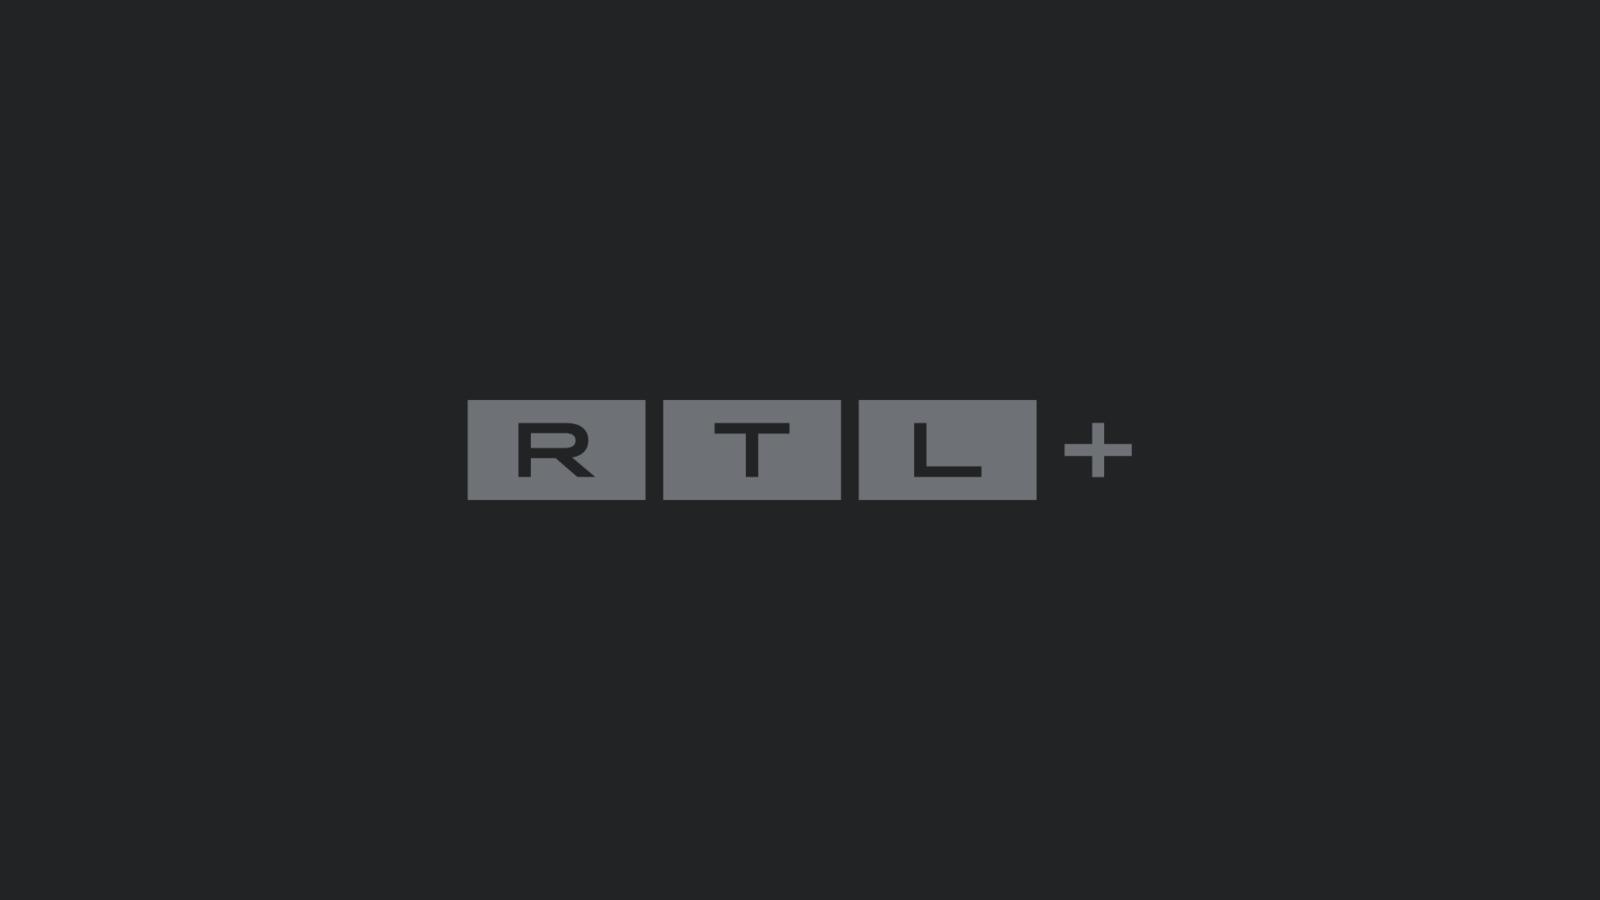 Folge 5 vom 25.09.2014 | Adam sucht Eva | Staffel 1 | TVNOW